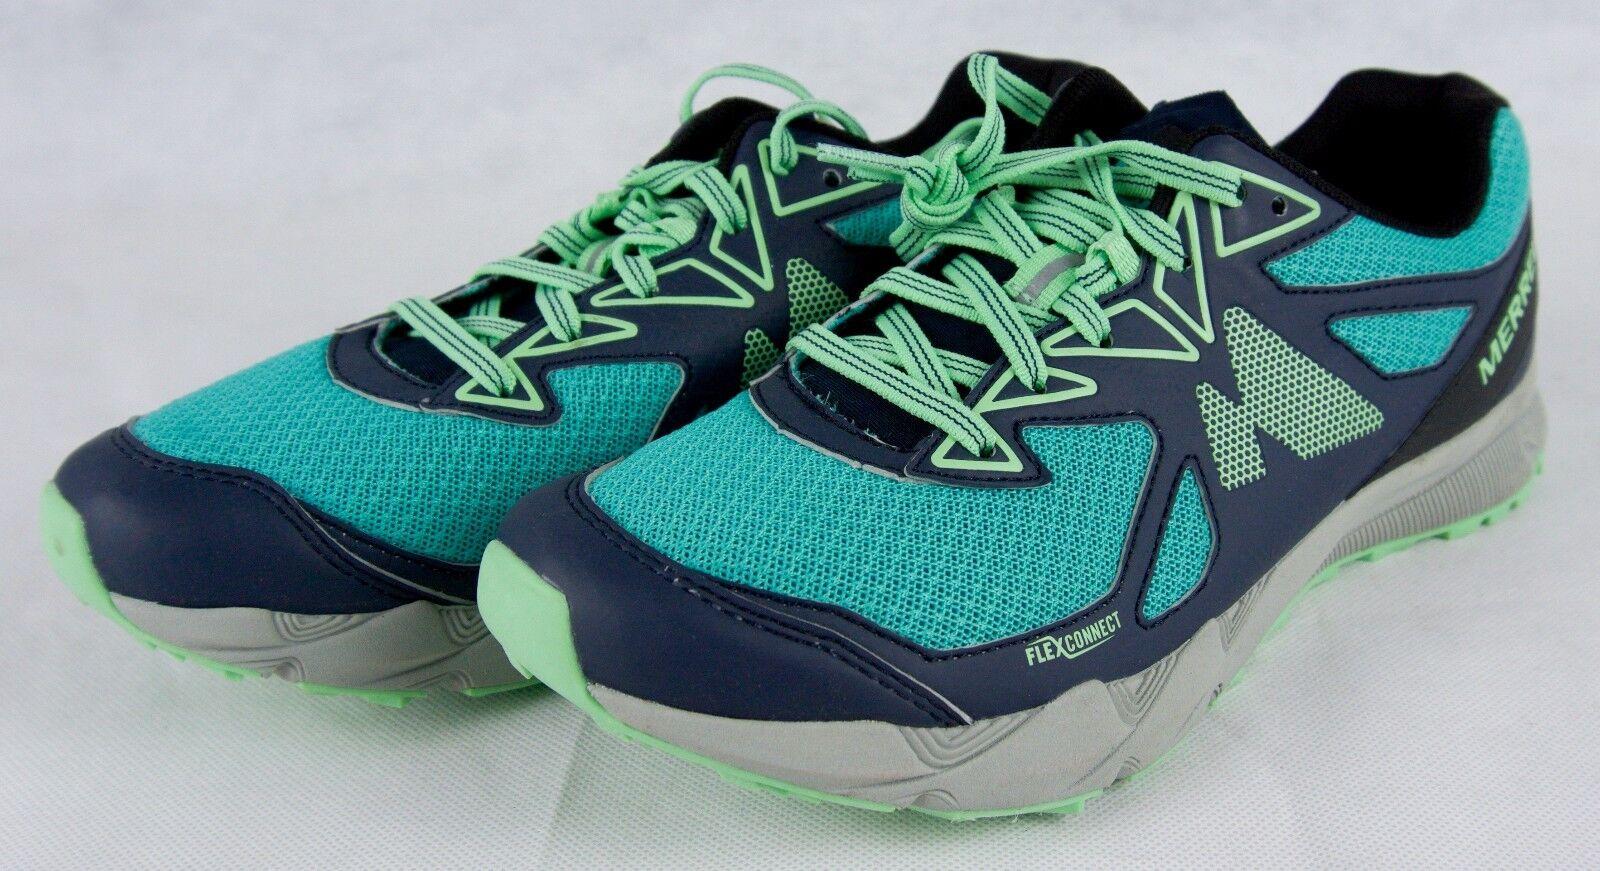 Merrell shoes Agility Fusion Flex Women's Size 7 Turquoise